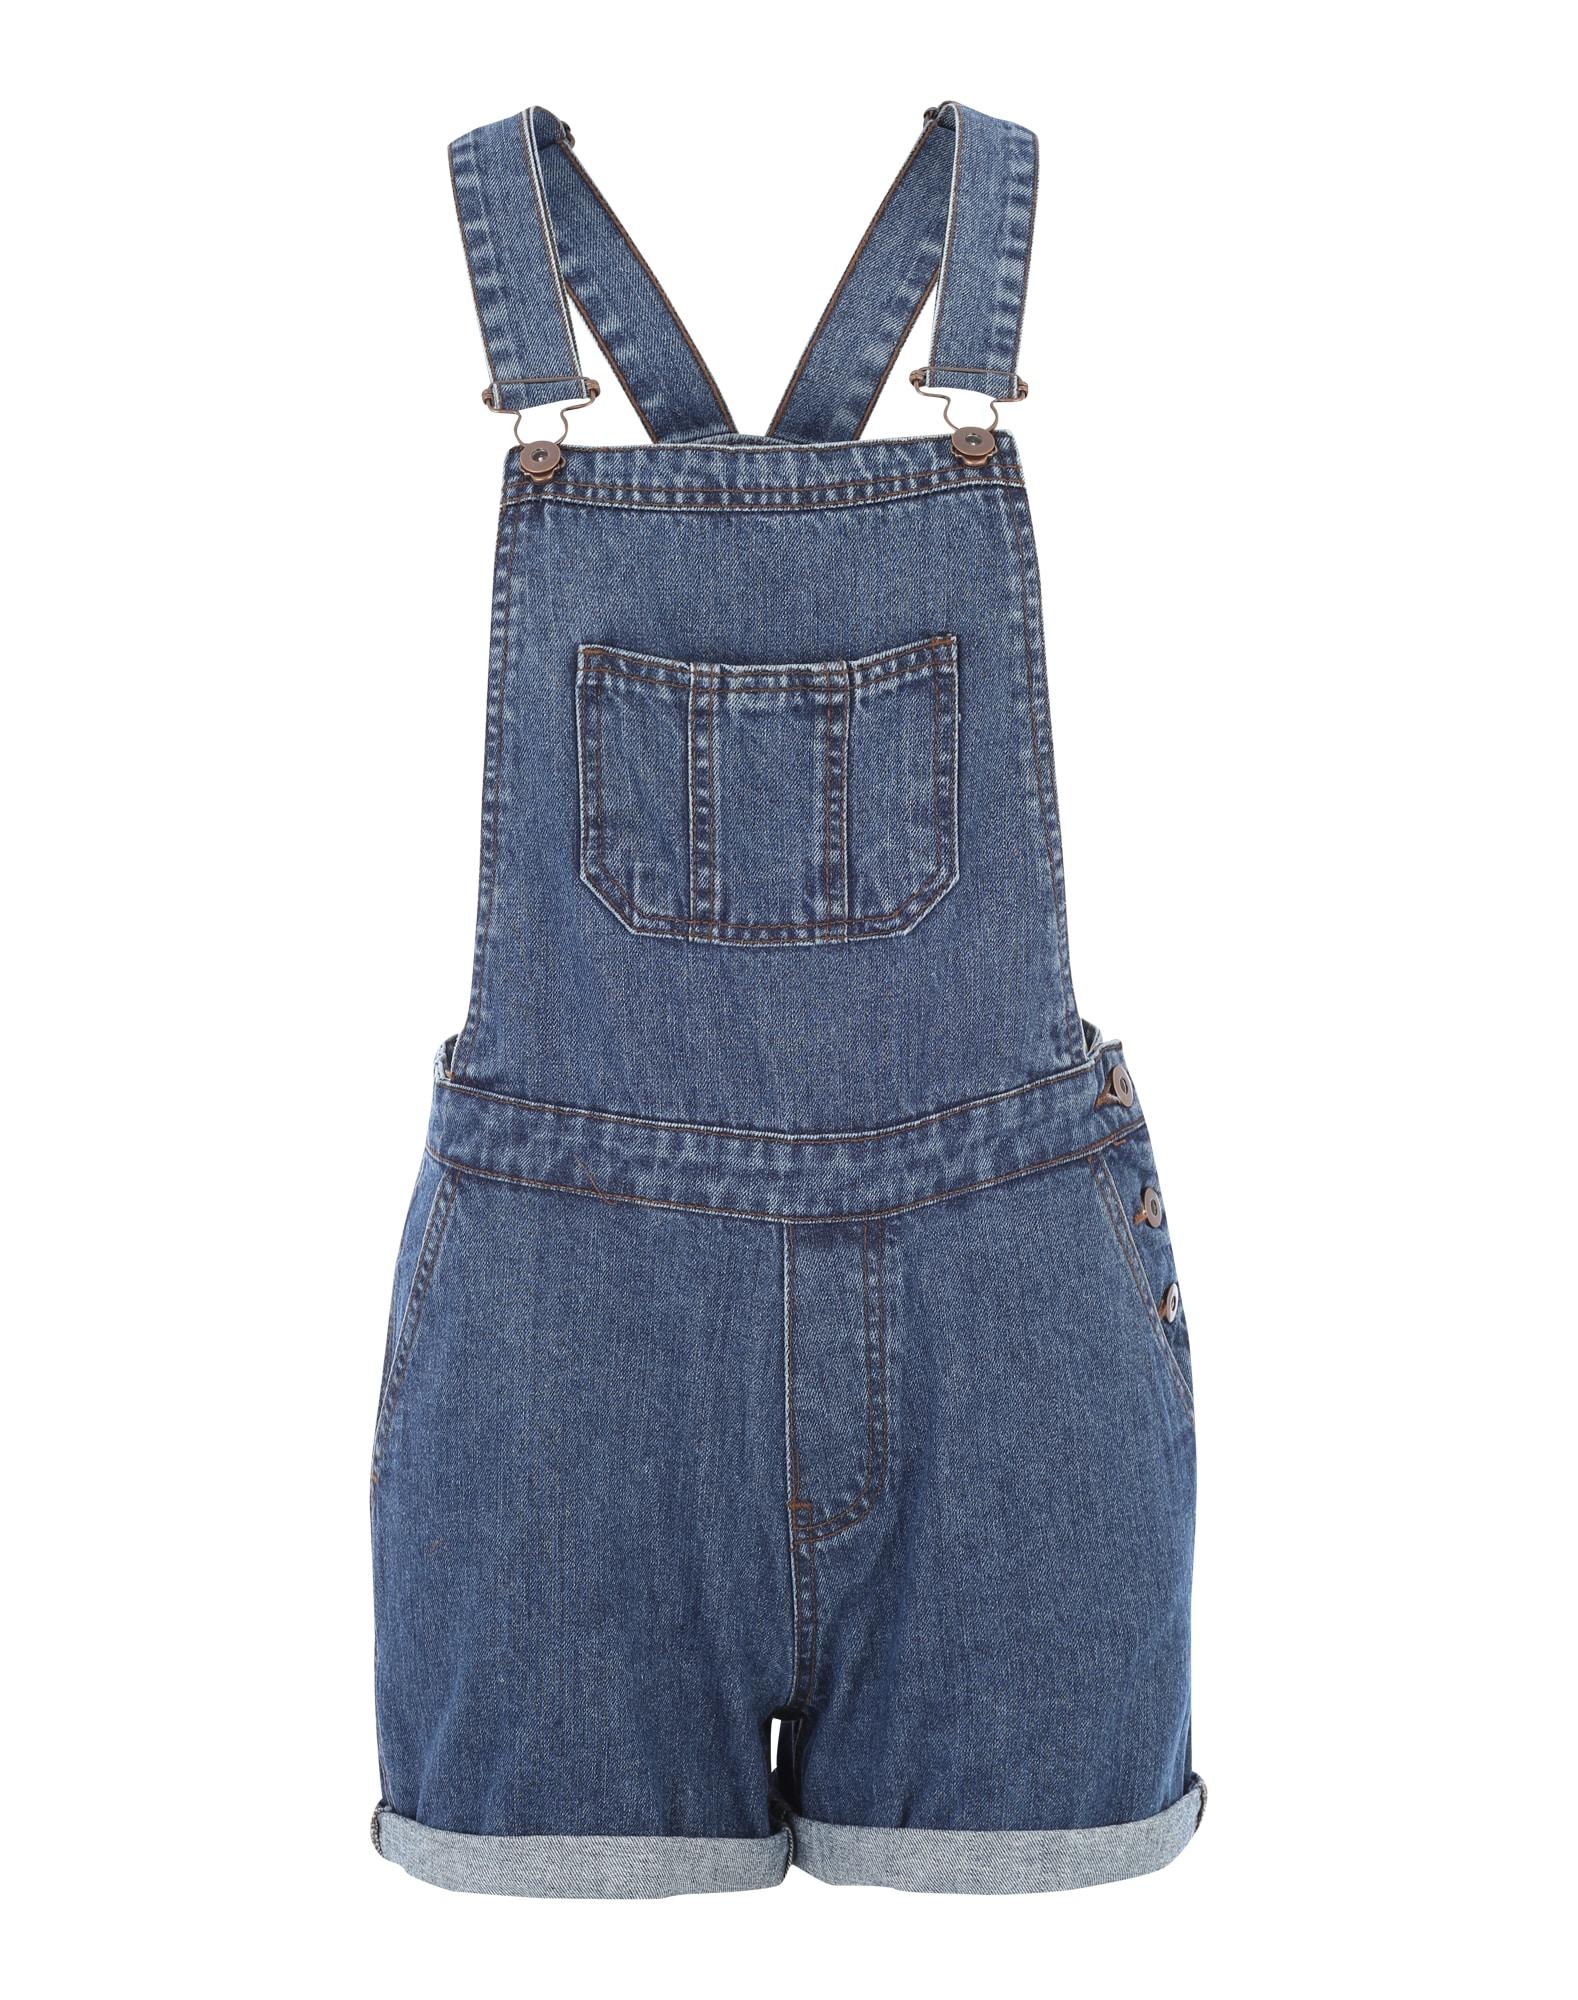 Latzjeans 'Dungaree'   Bekleidung > Jeans > Latzjeans   Blue   Urban Classics